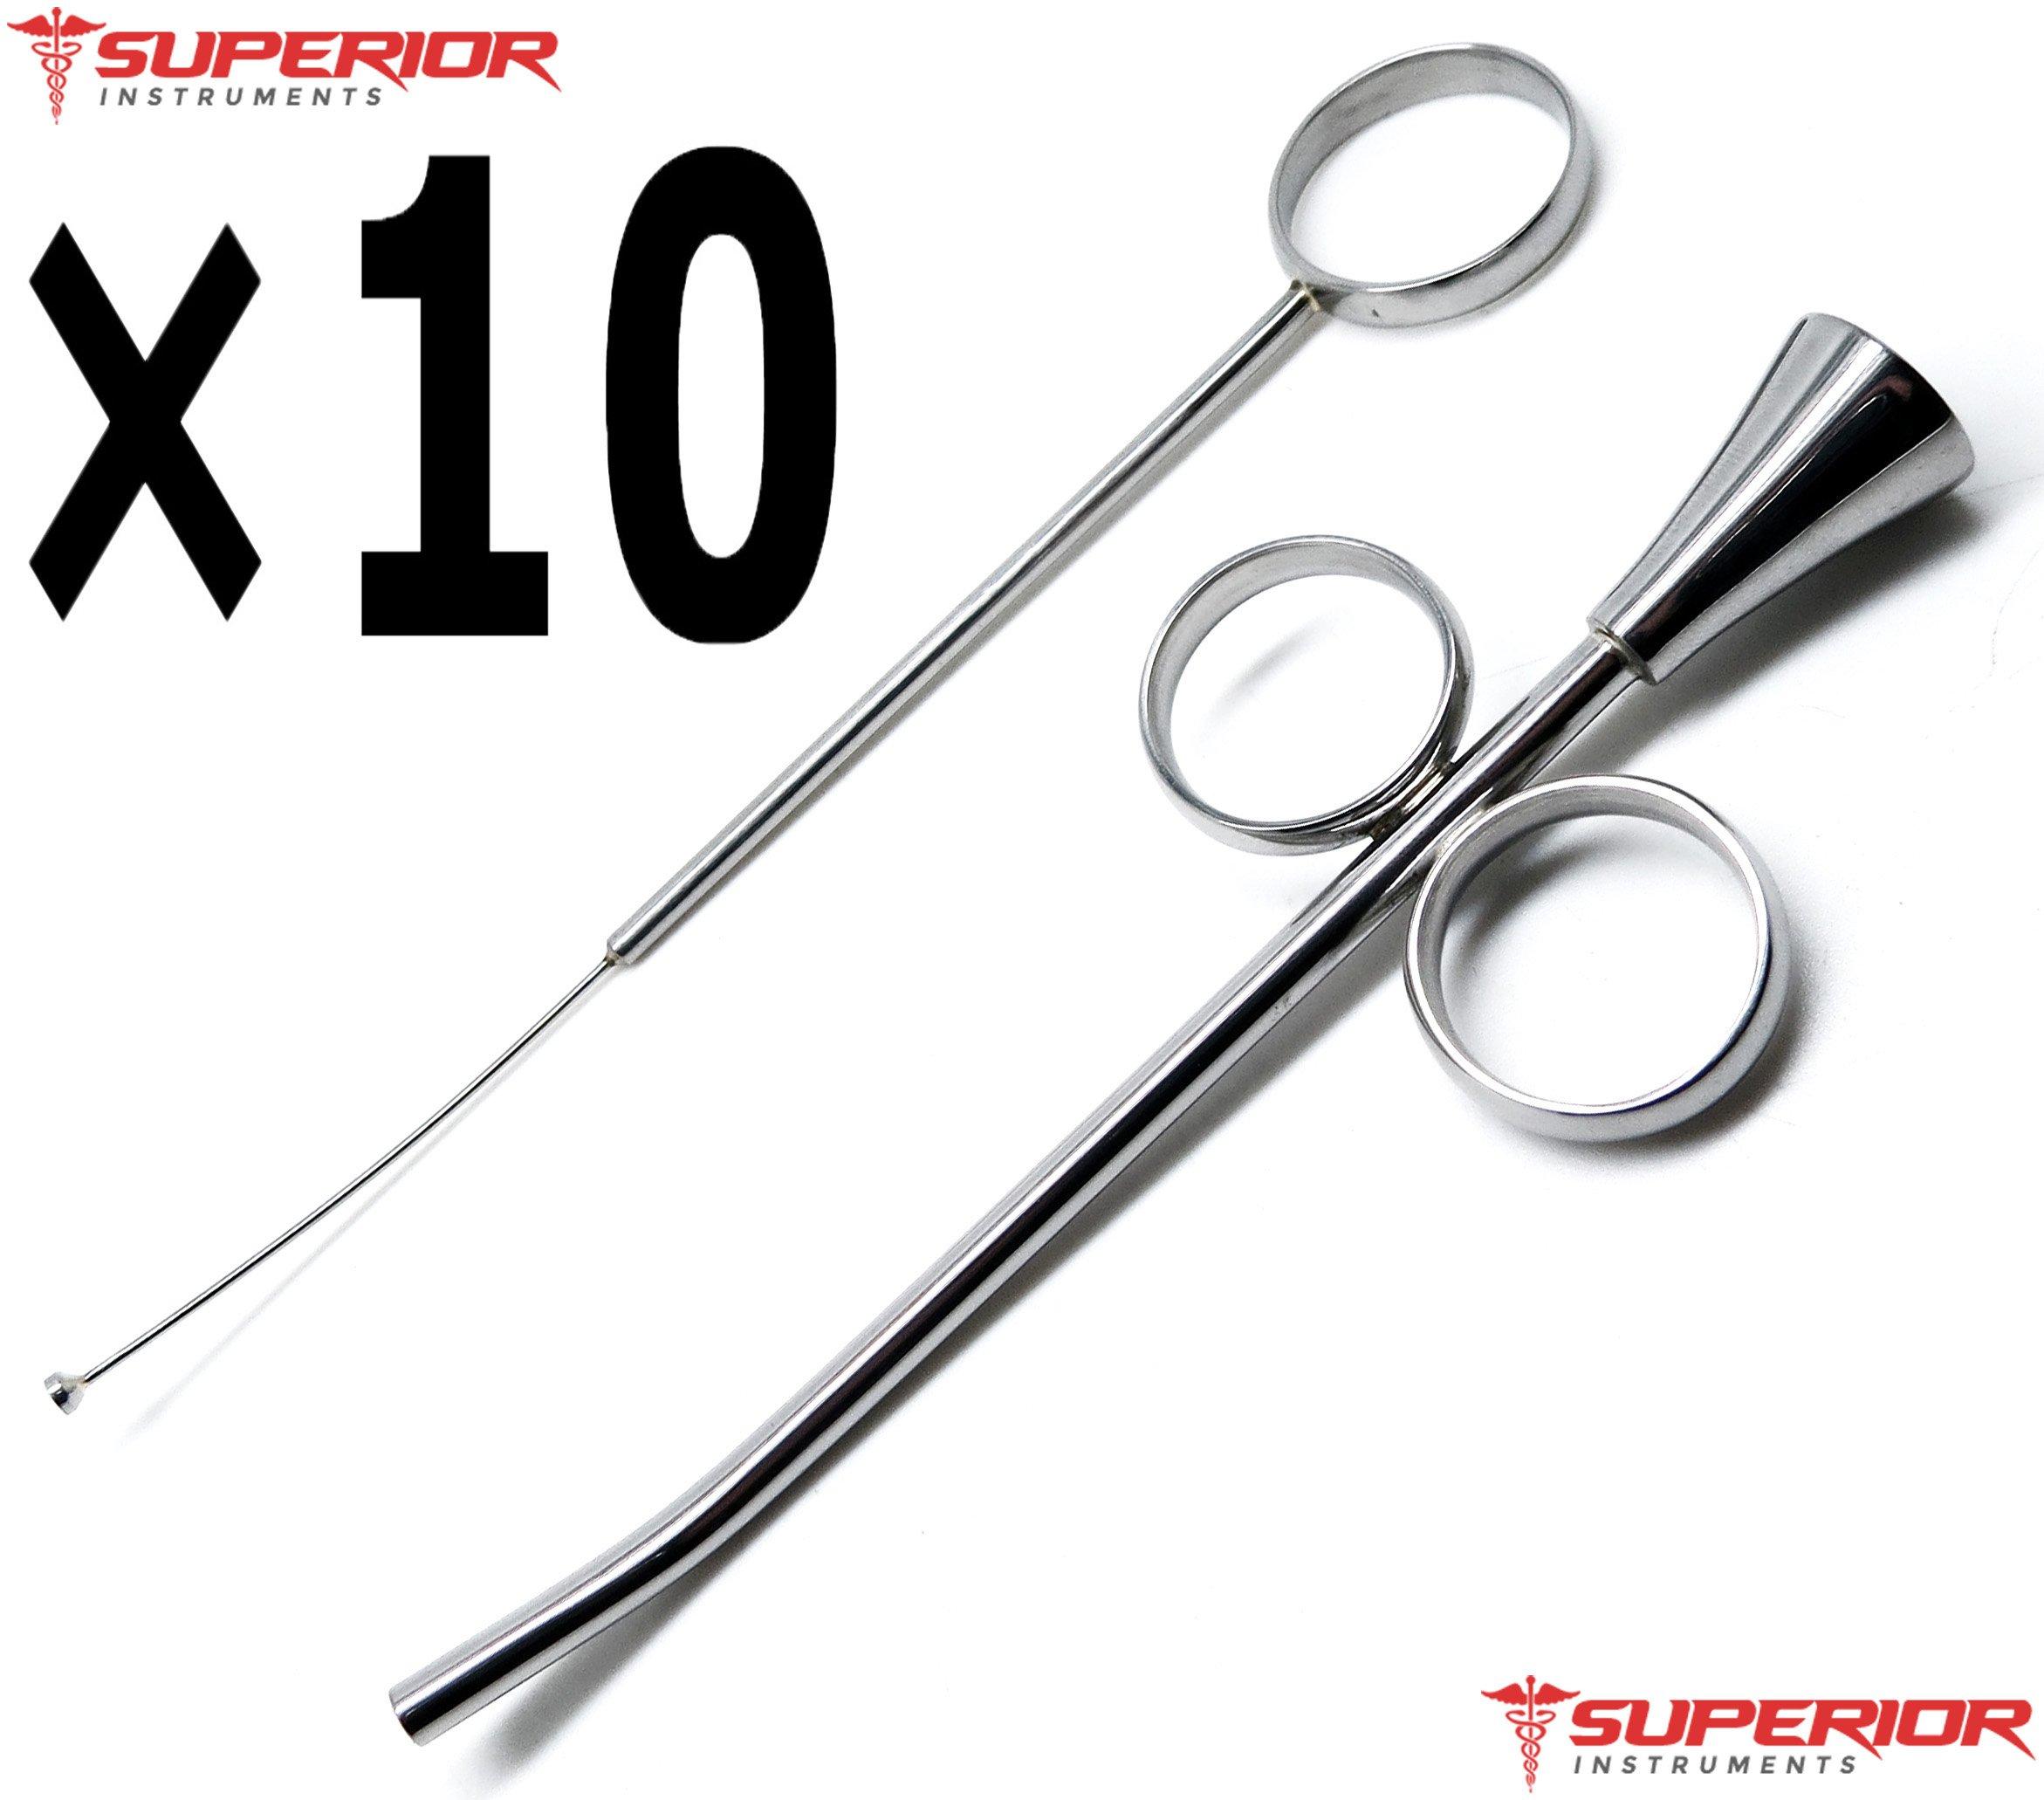 10 Pcs Superior Dental Syringes 4.5mm Amalgam Implant UPGRADED DESIGN Stainless Steel Instruments